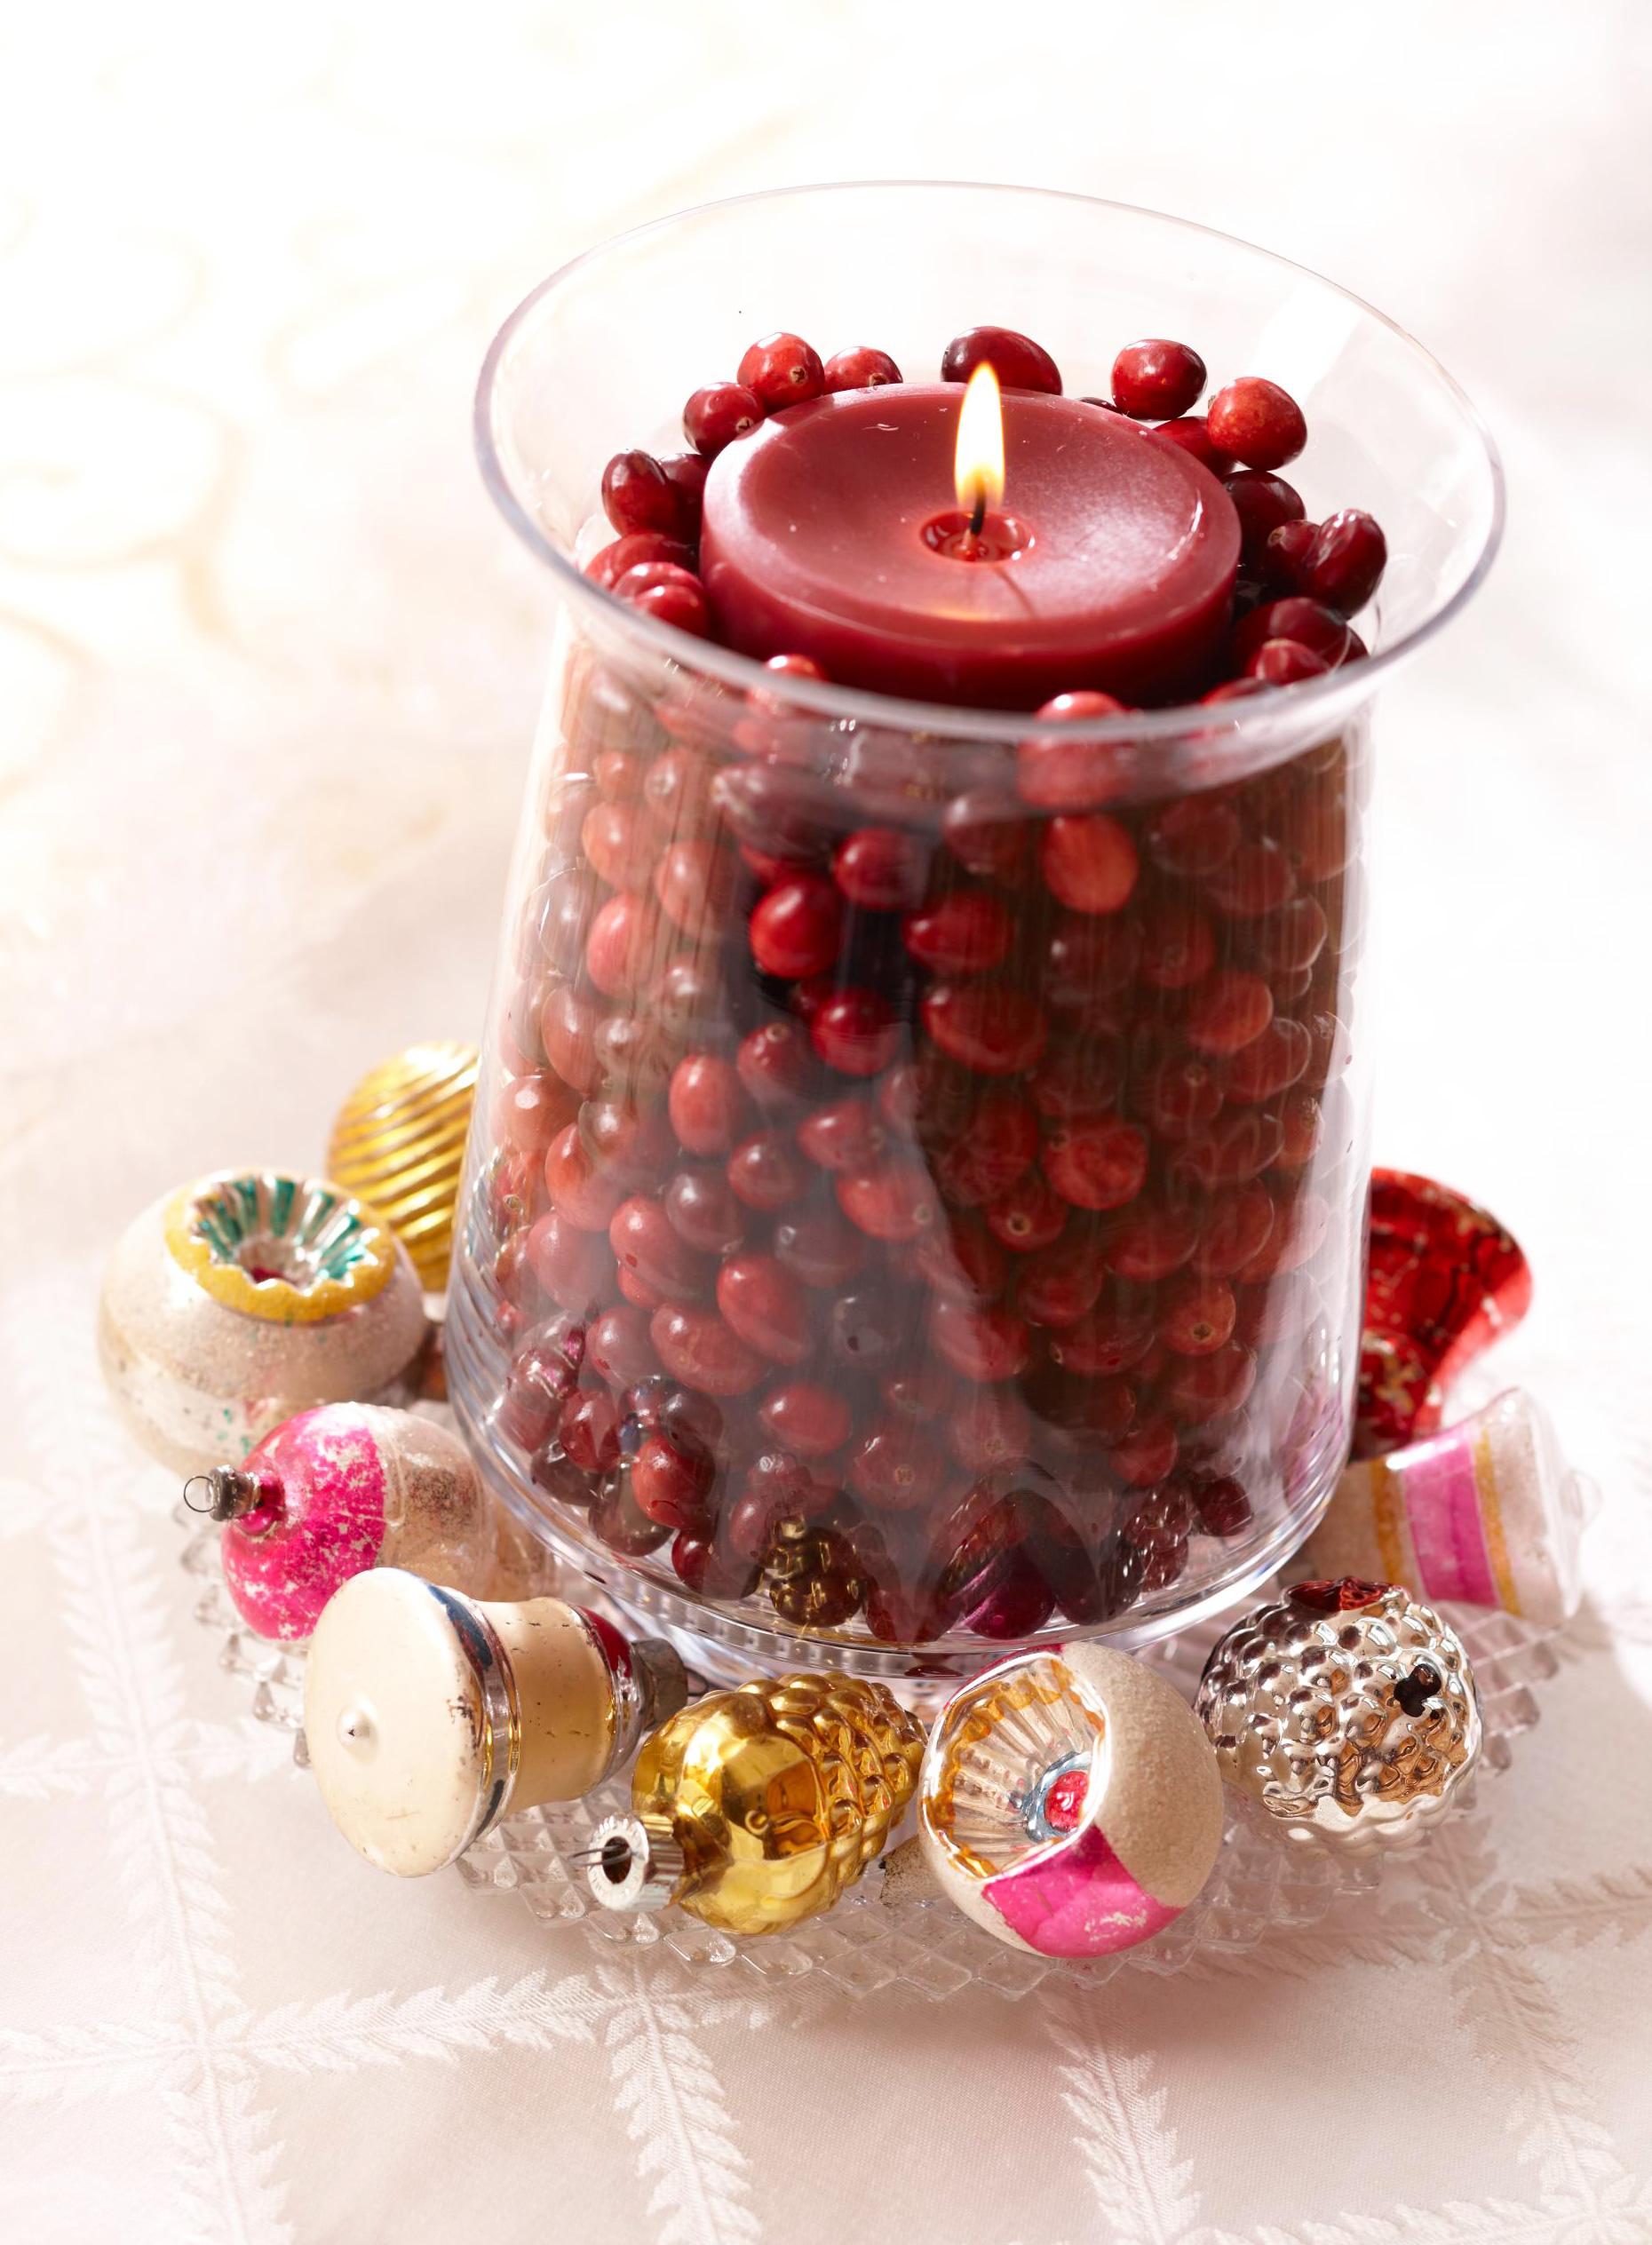 Christmas centerpiece ideas: cranberry candle